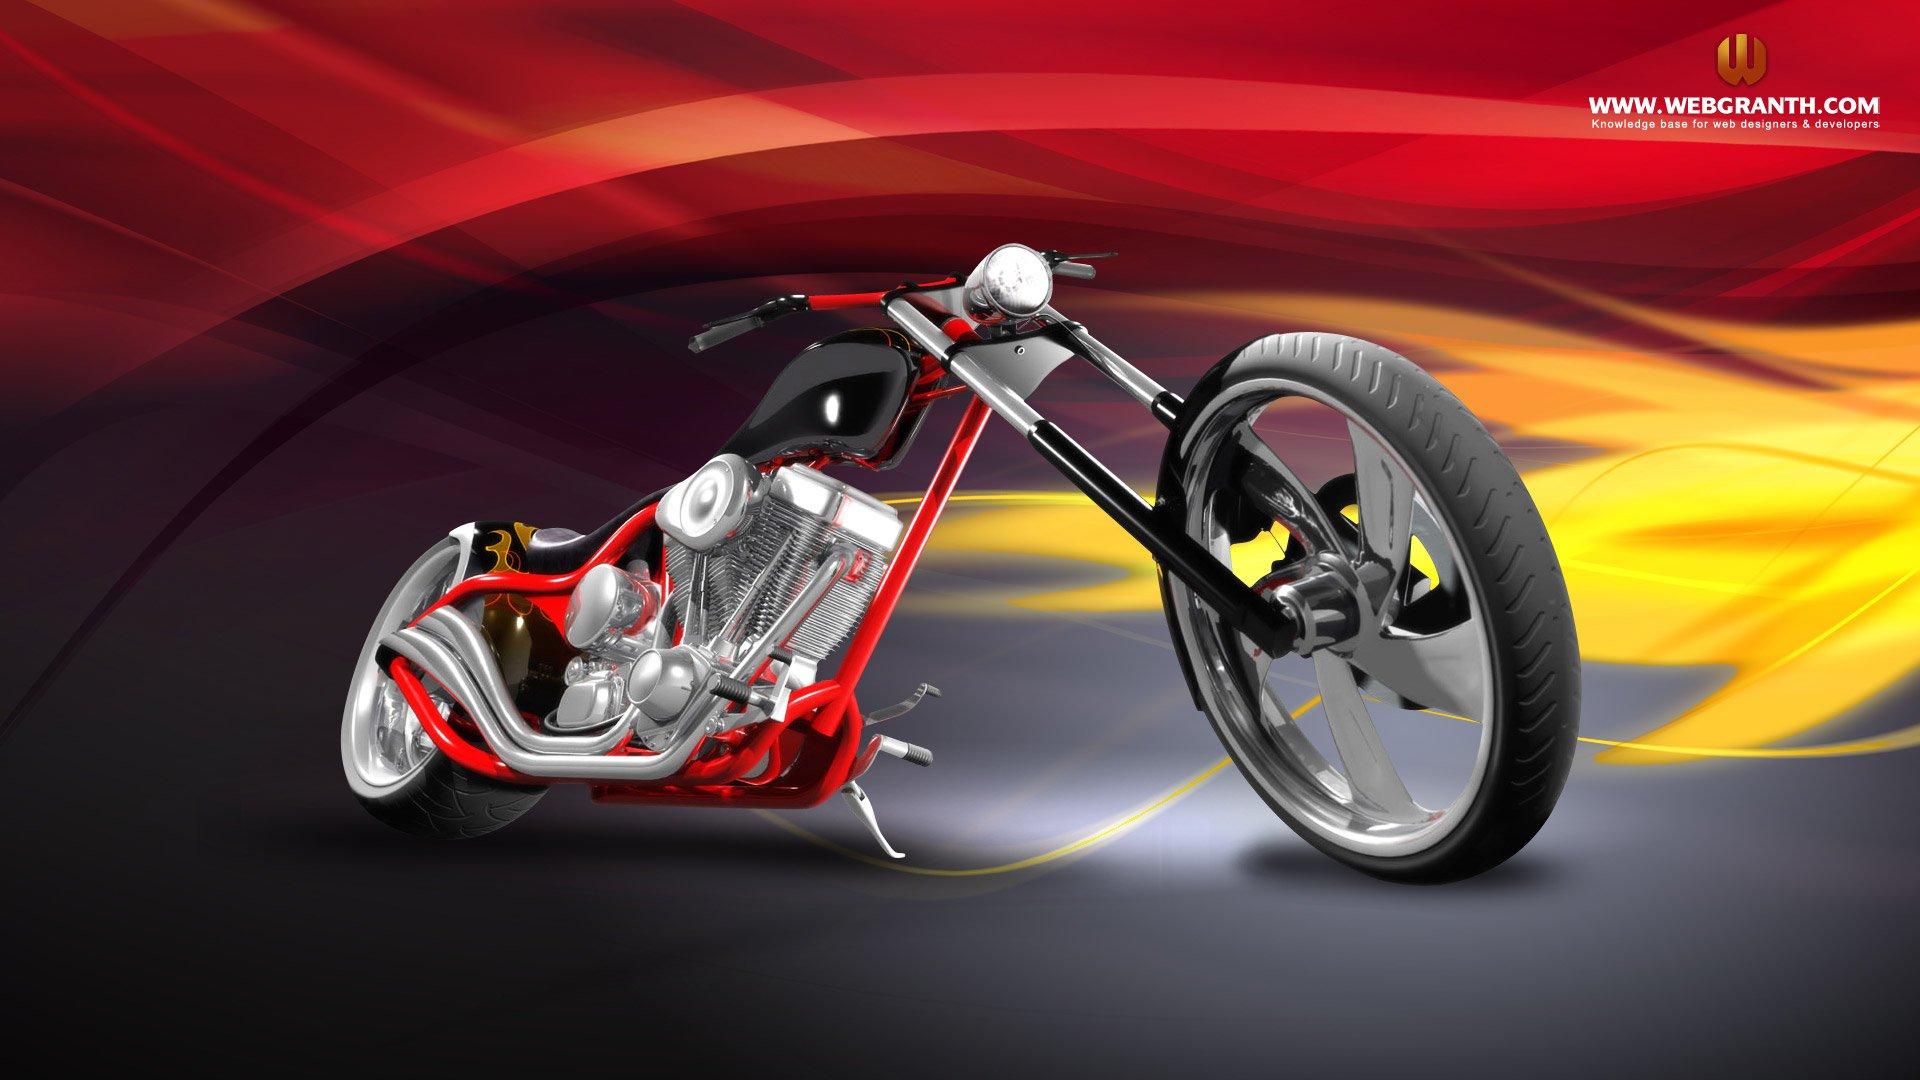 Wallpaper download bike - Bikes Download Latest Bike Free Webgranth Wallpaper 1920x1080 590293 Wallpaperup